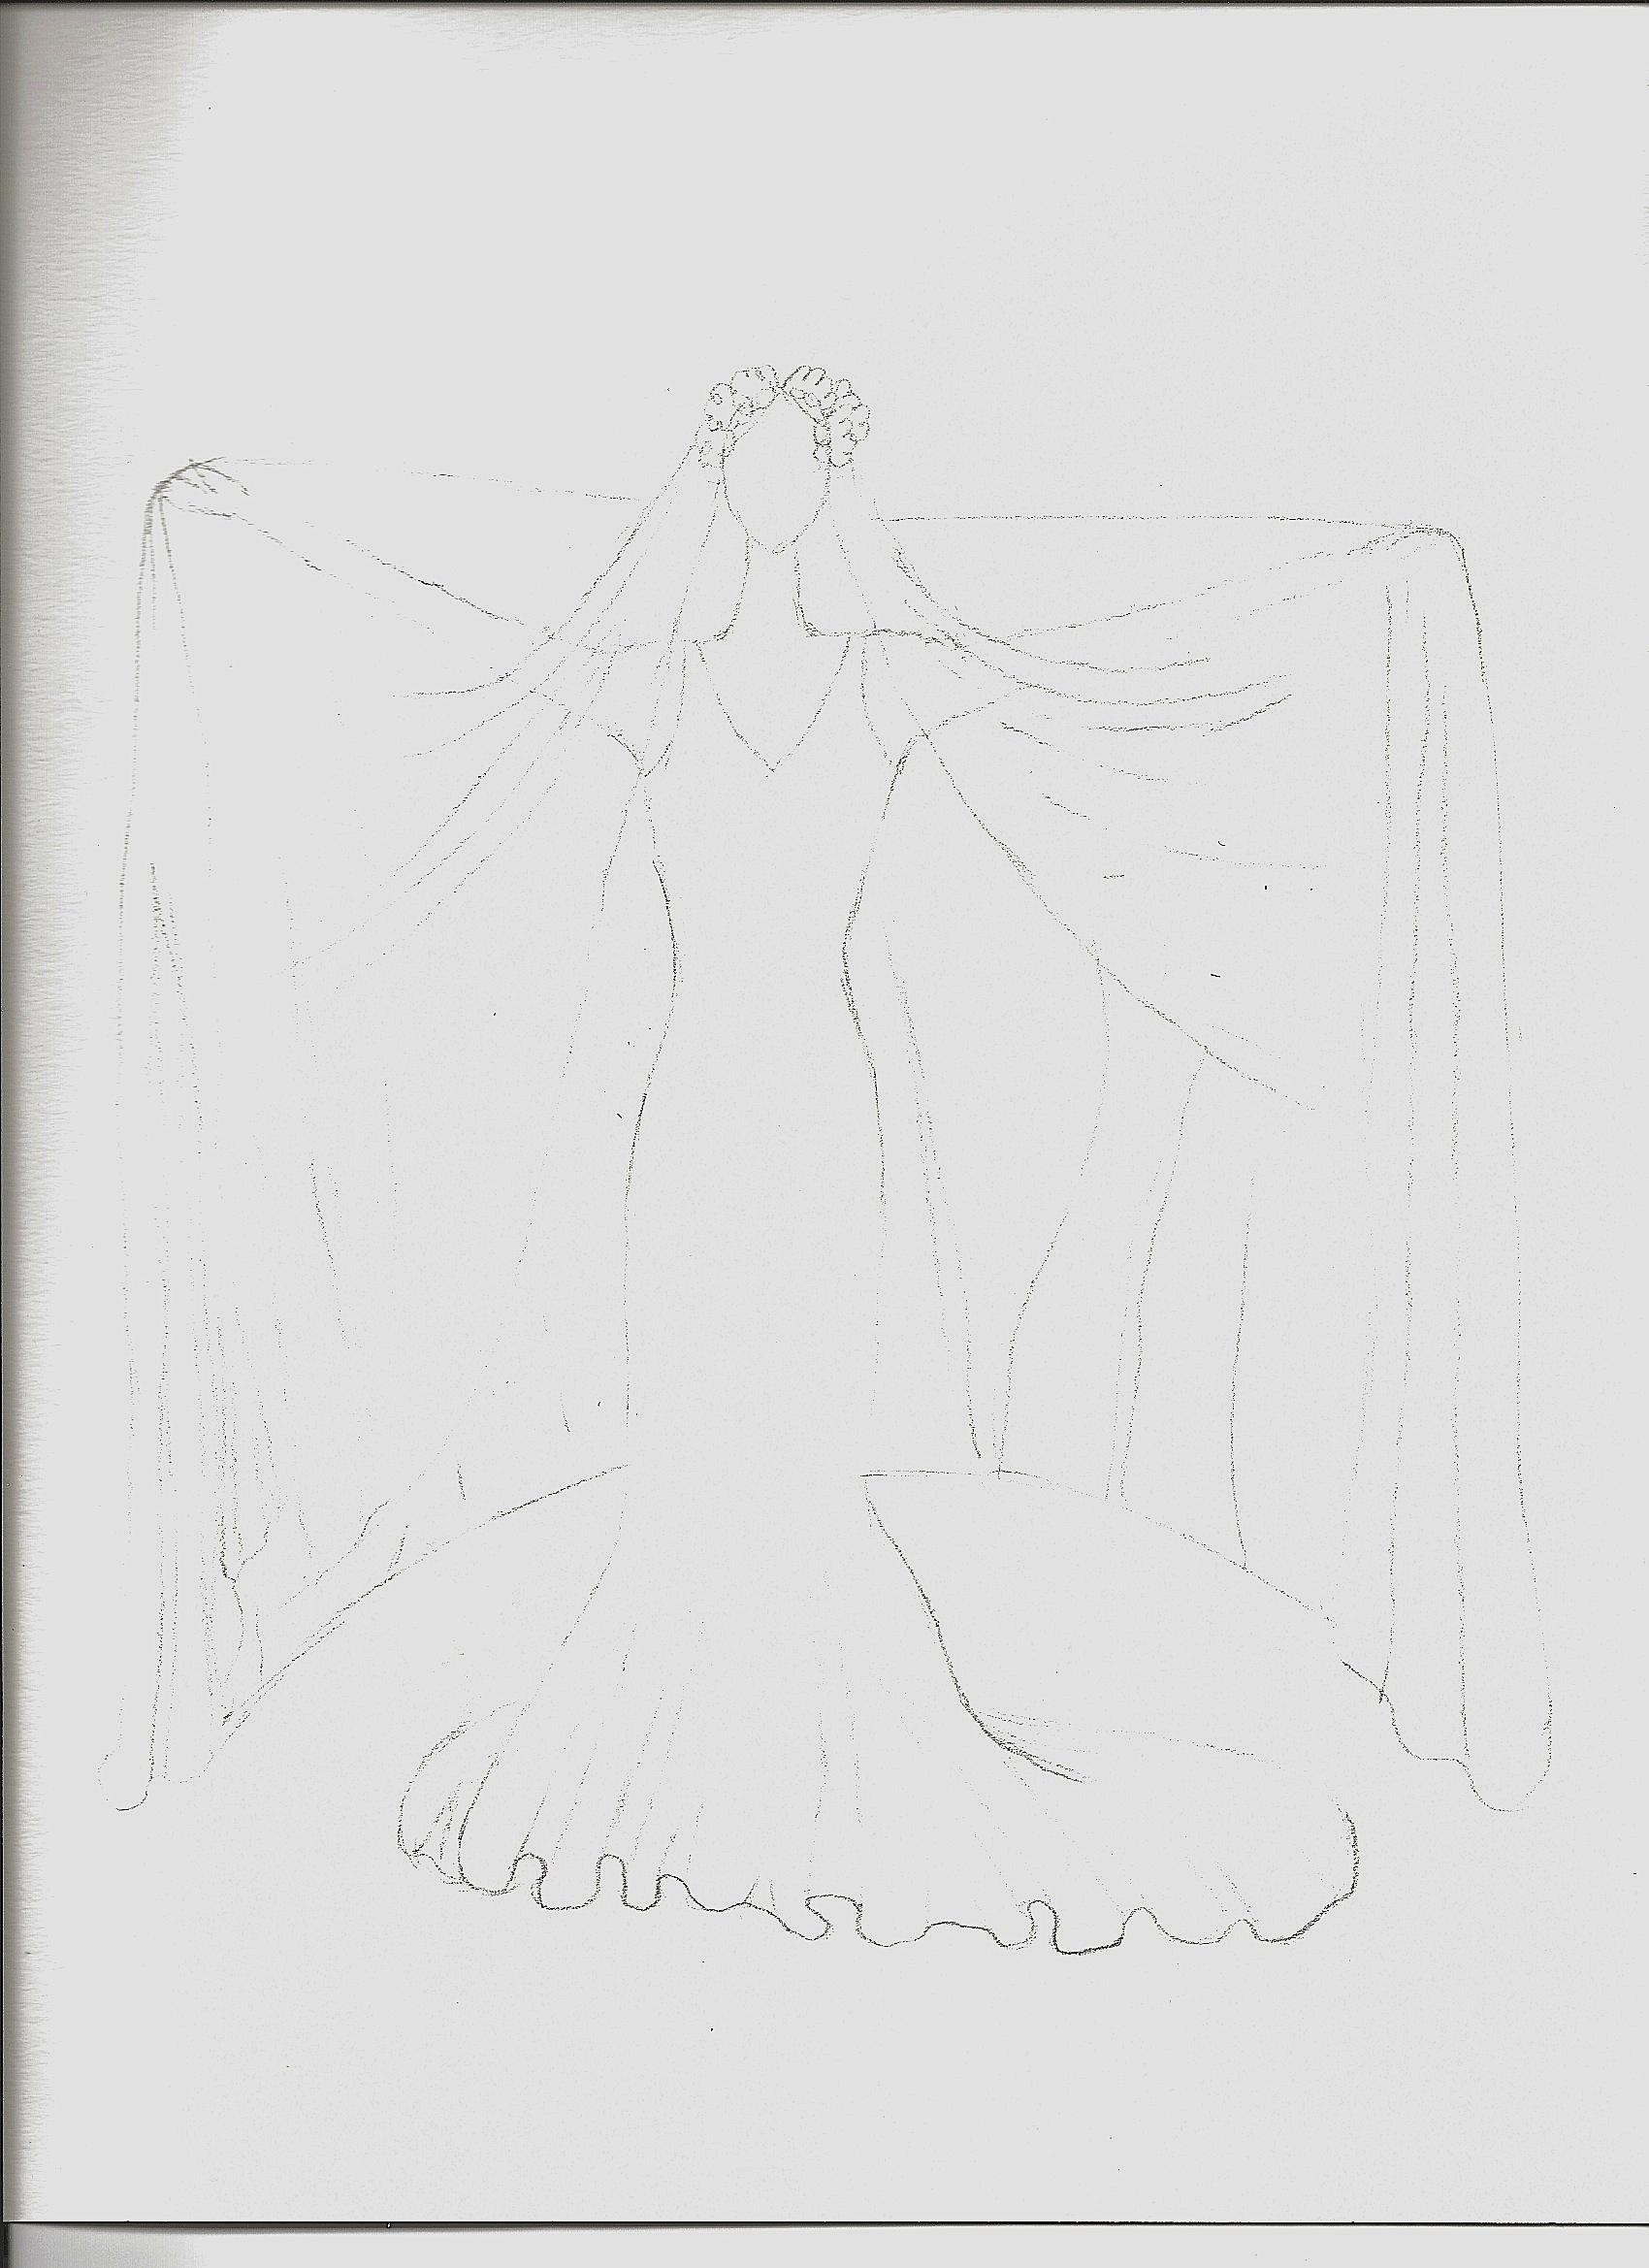 SKETCH - Vintage Romance  - image 3 - student project